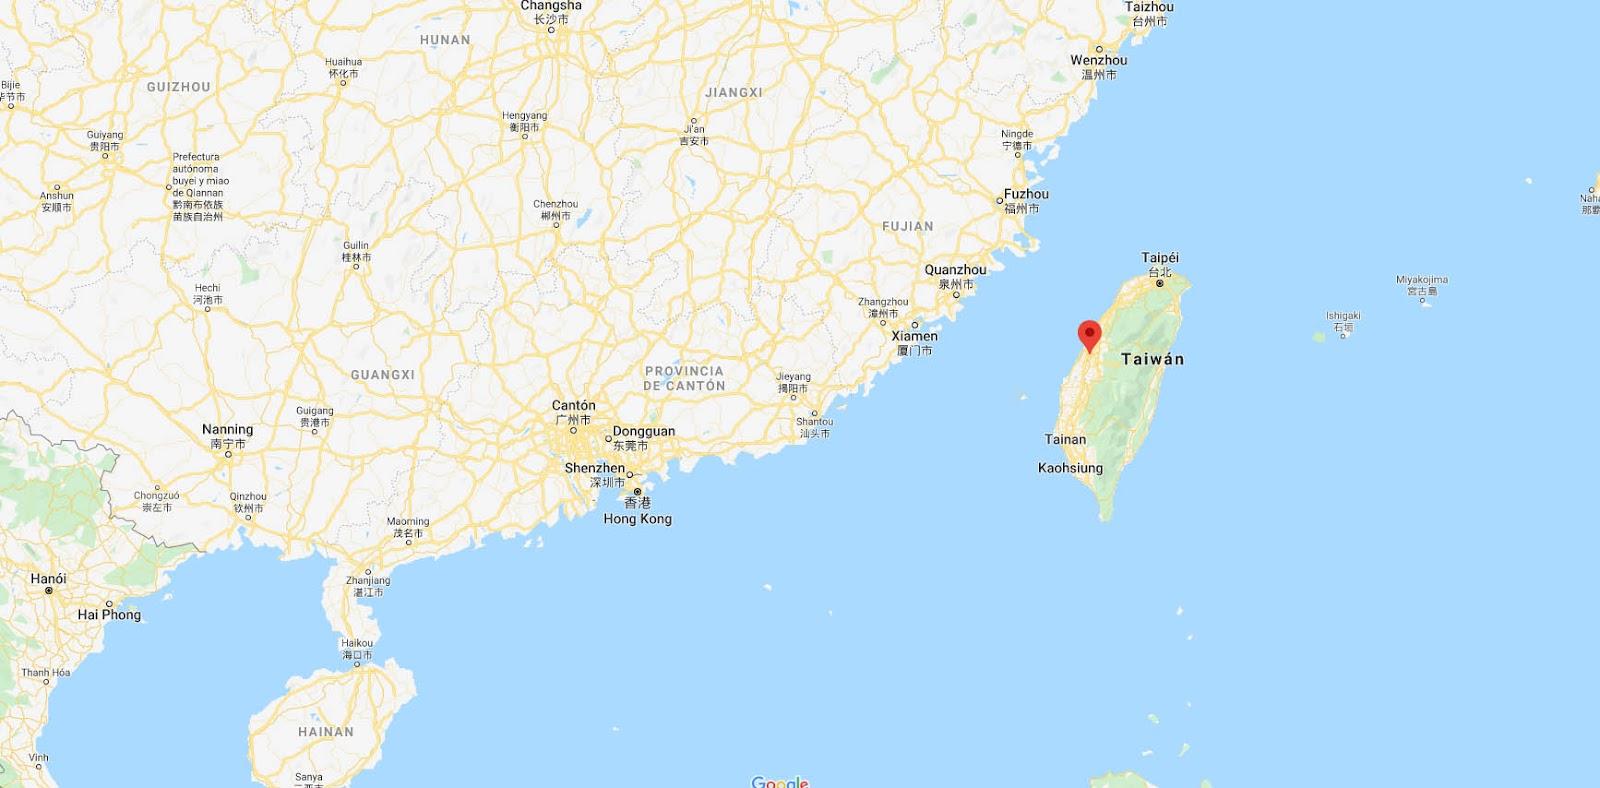 mapa_Condado_Changhua_Taiwán